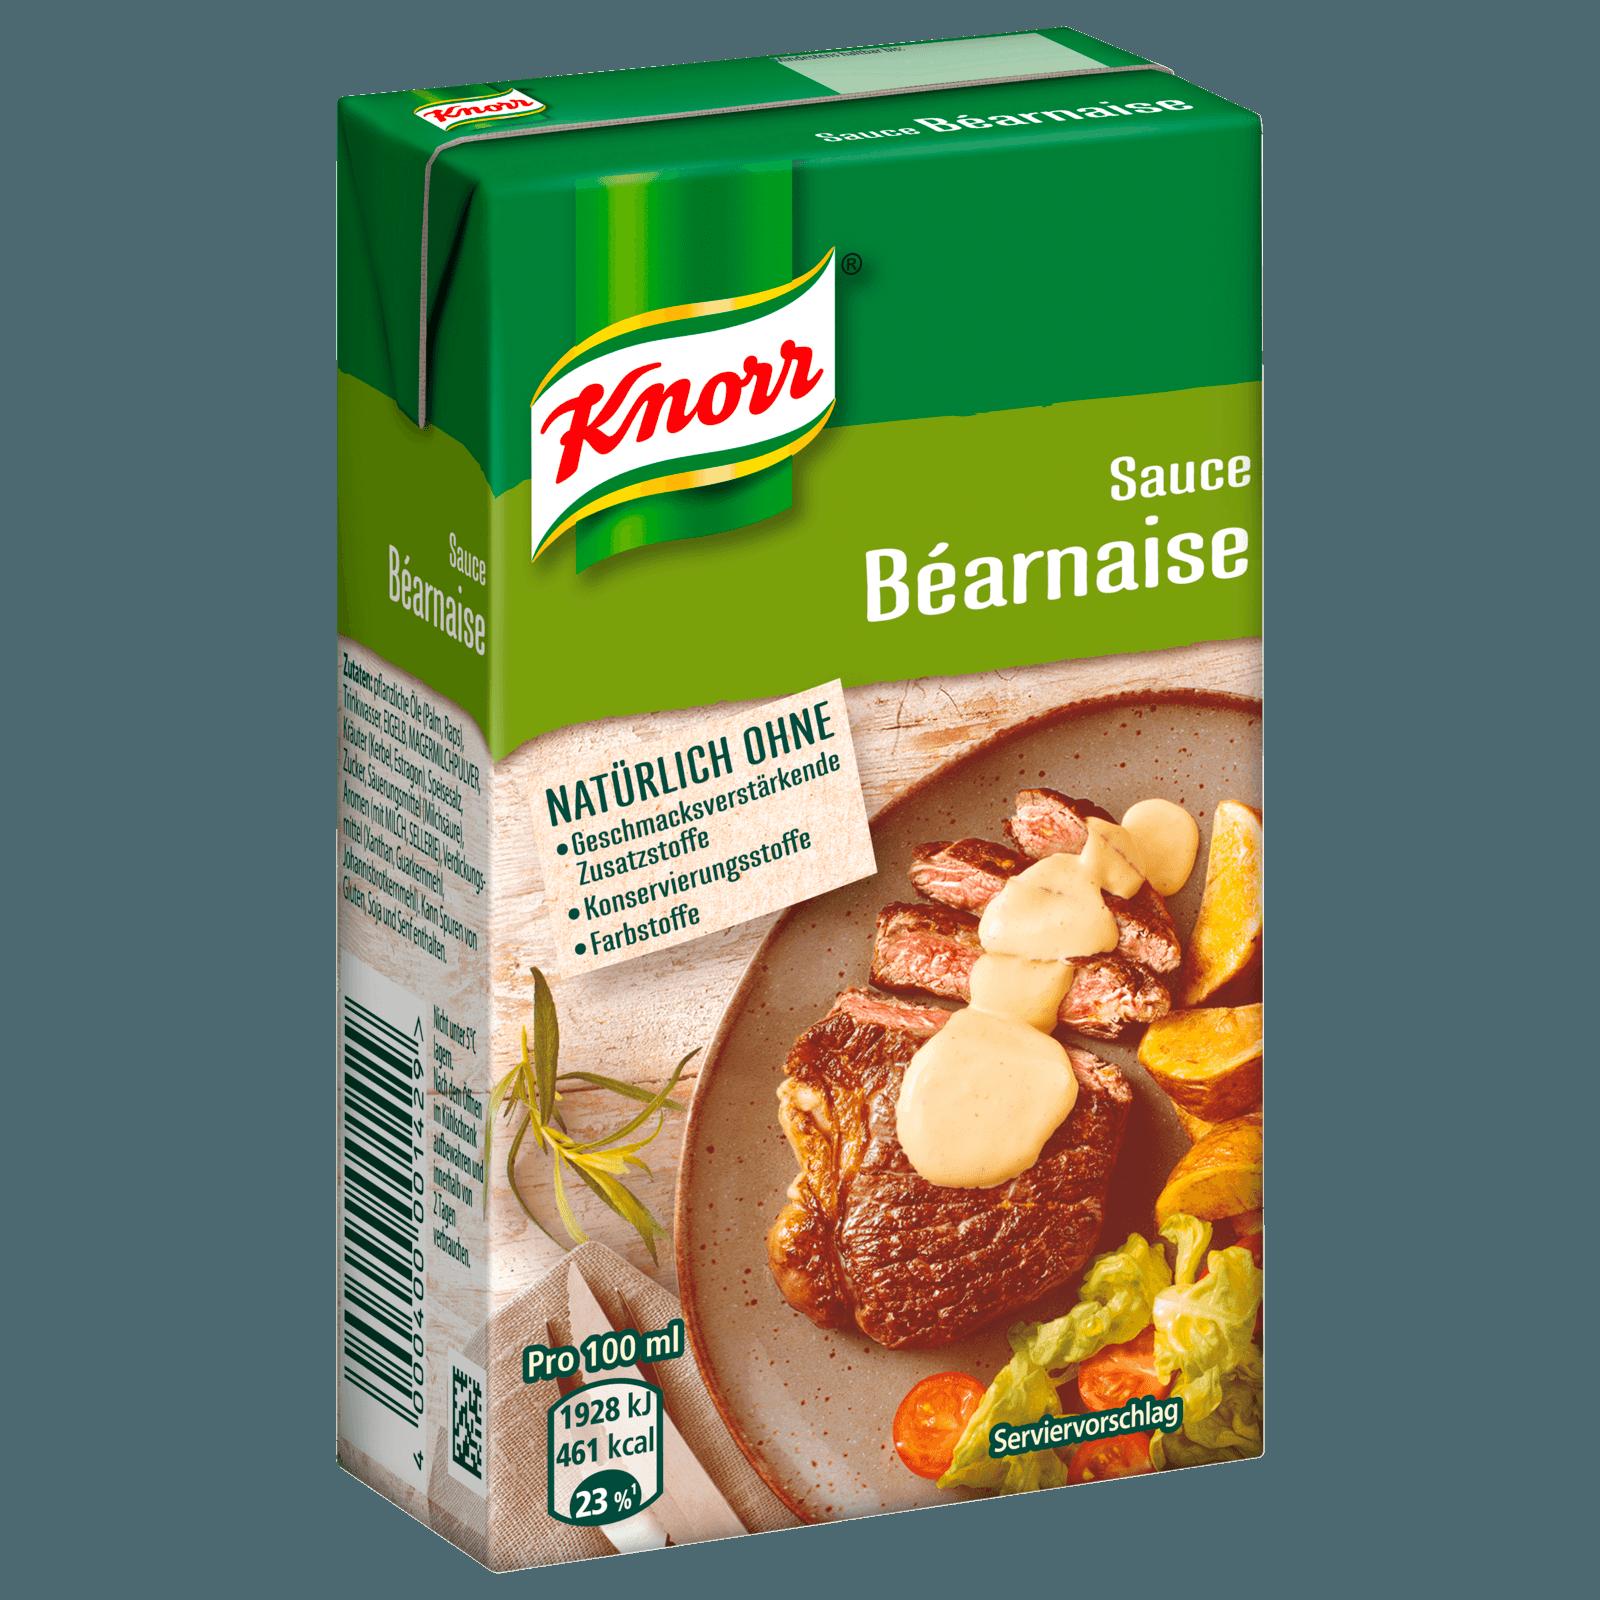 Knorr Sauce Béarnaise 250ml bei REWE online bestellen!